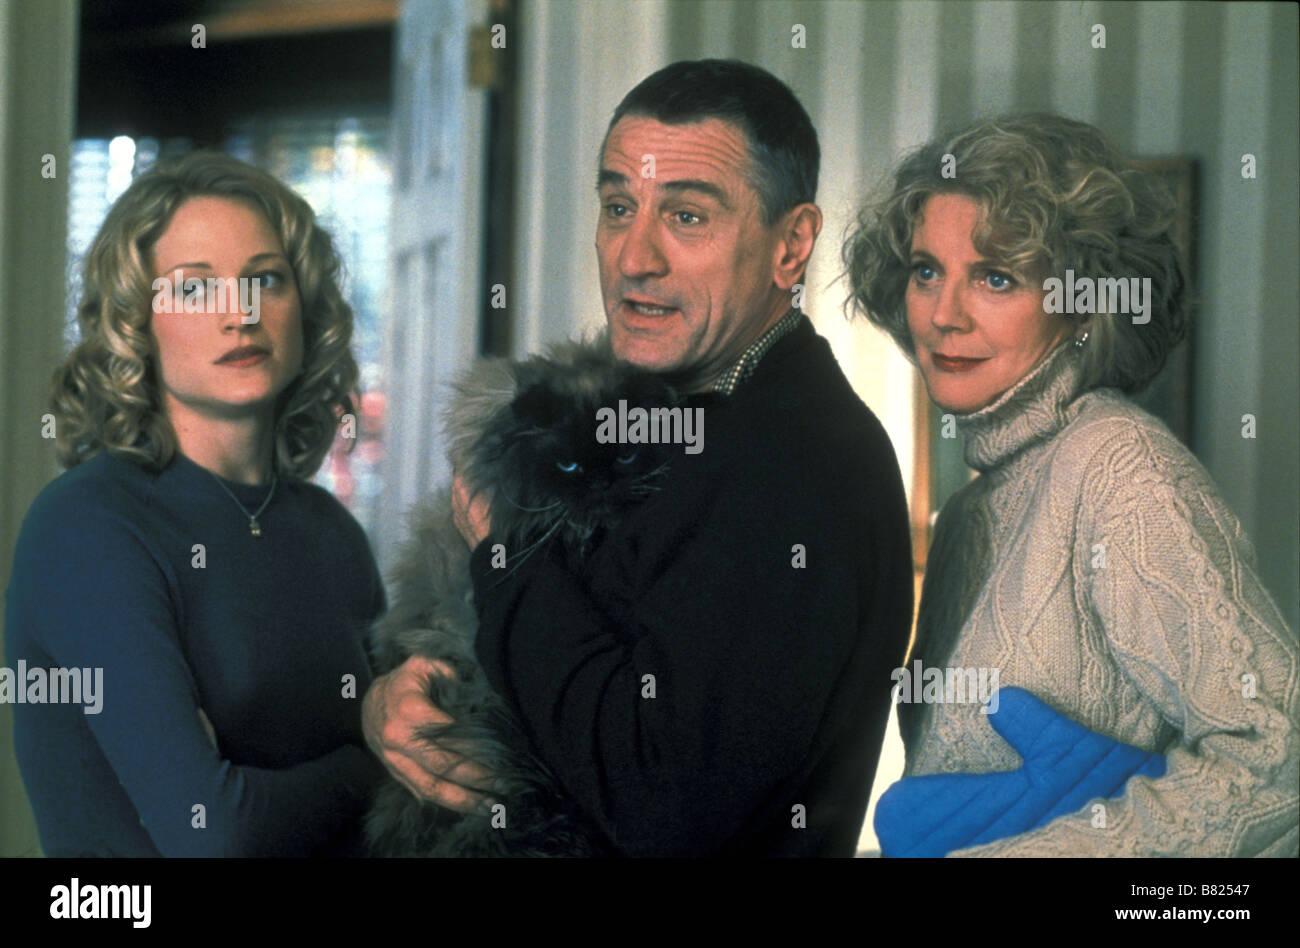 Meet the Parents  Year: 2000 USA Teri Polo, Blythe Danner, Robert De Niro  Director: Jay Roach - Stock Image